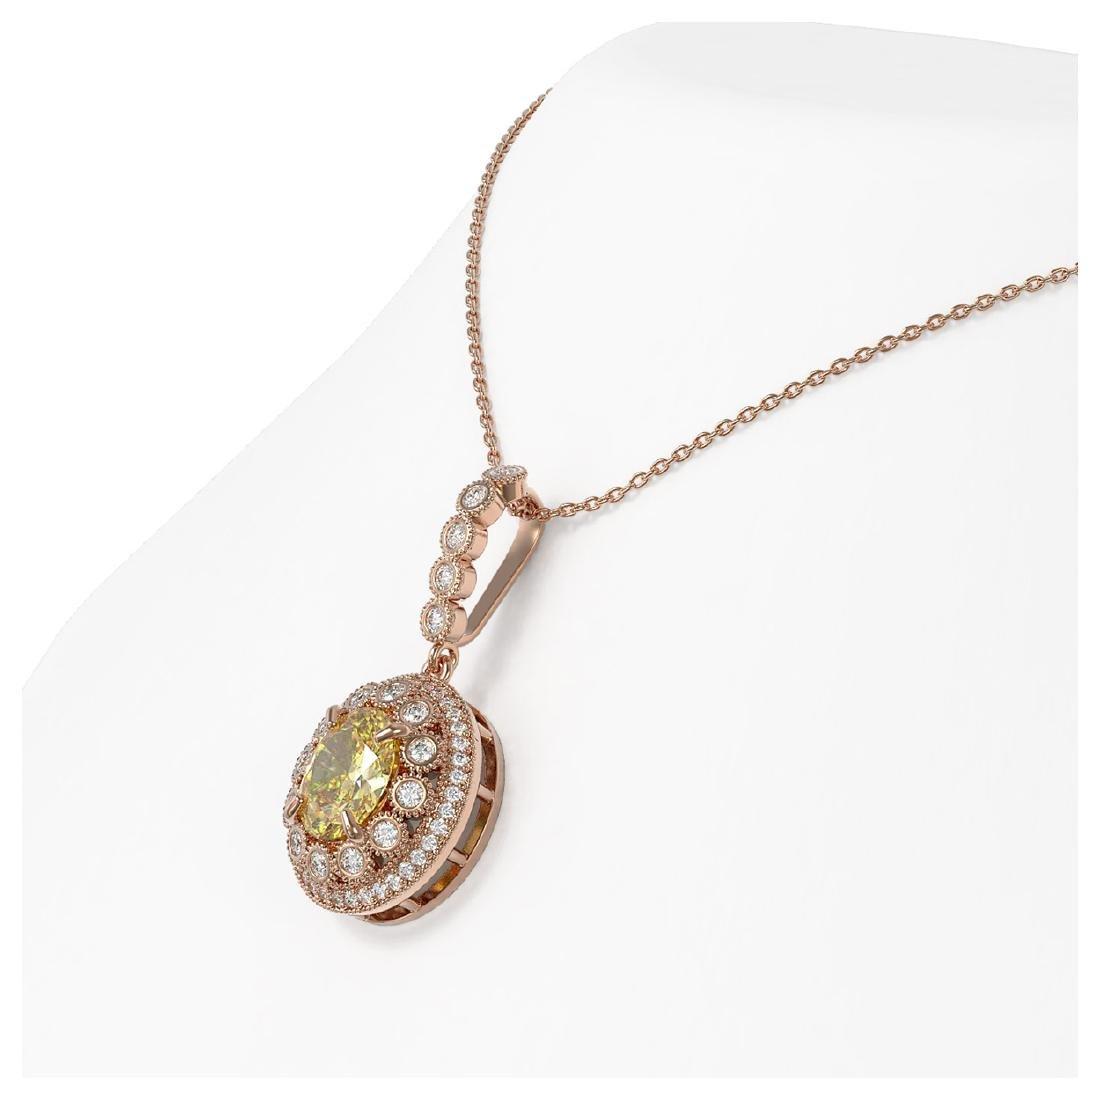 3.87 ctw Canary Citrine & Diamond Necklace 14K Rose - 3